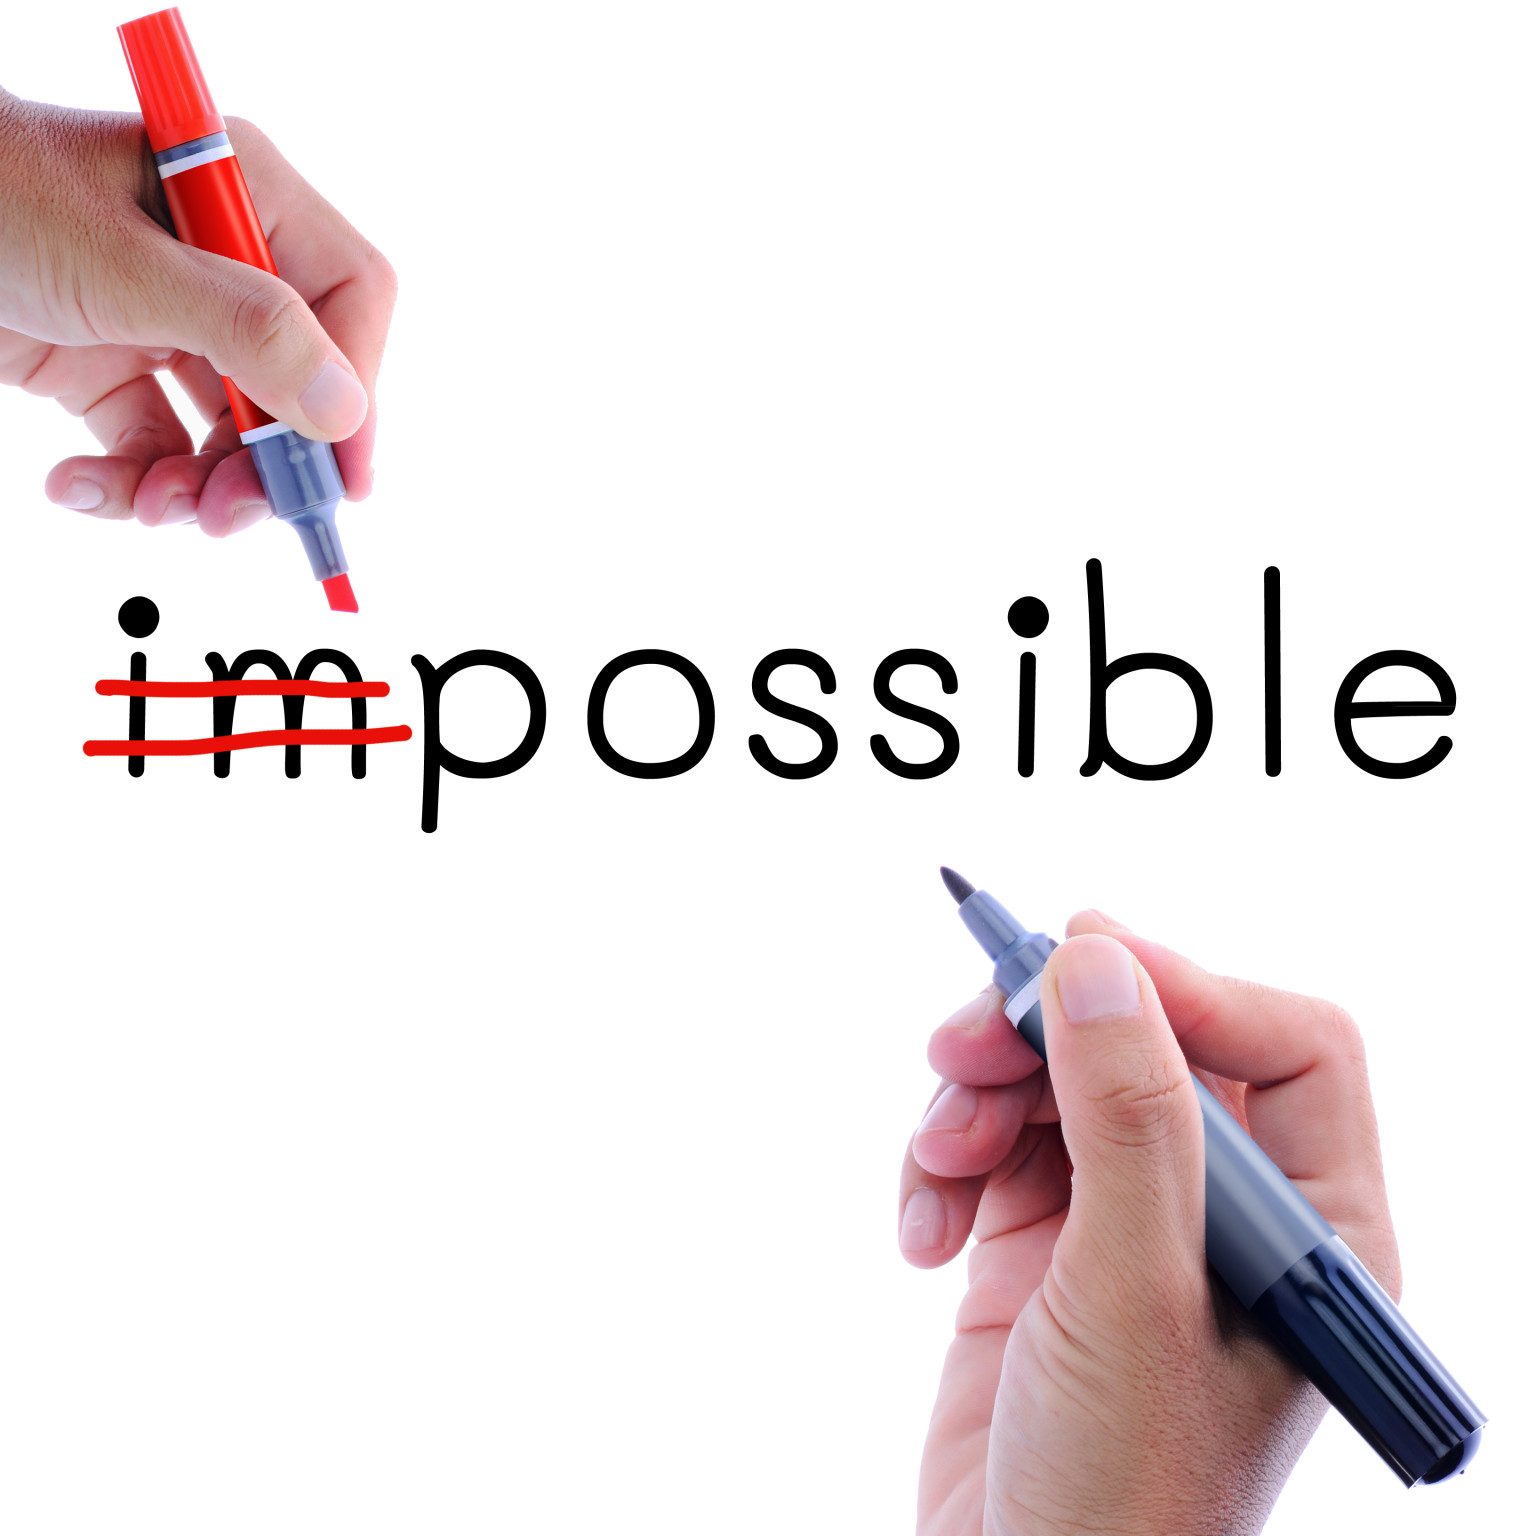 am optimistic person essay